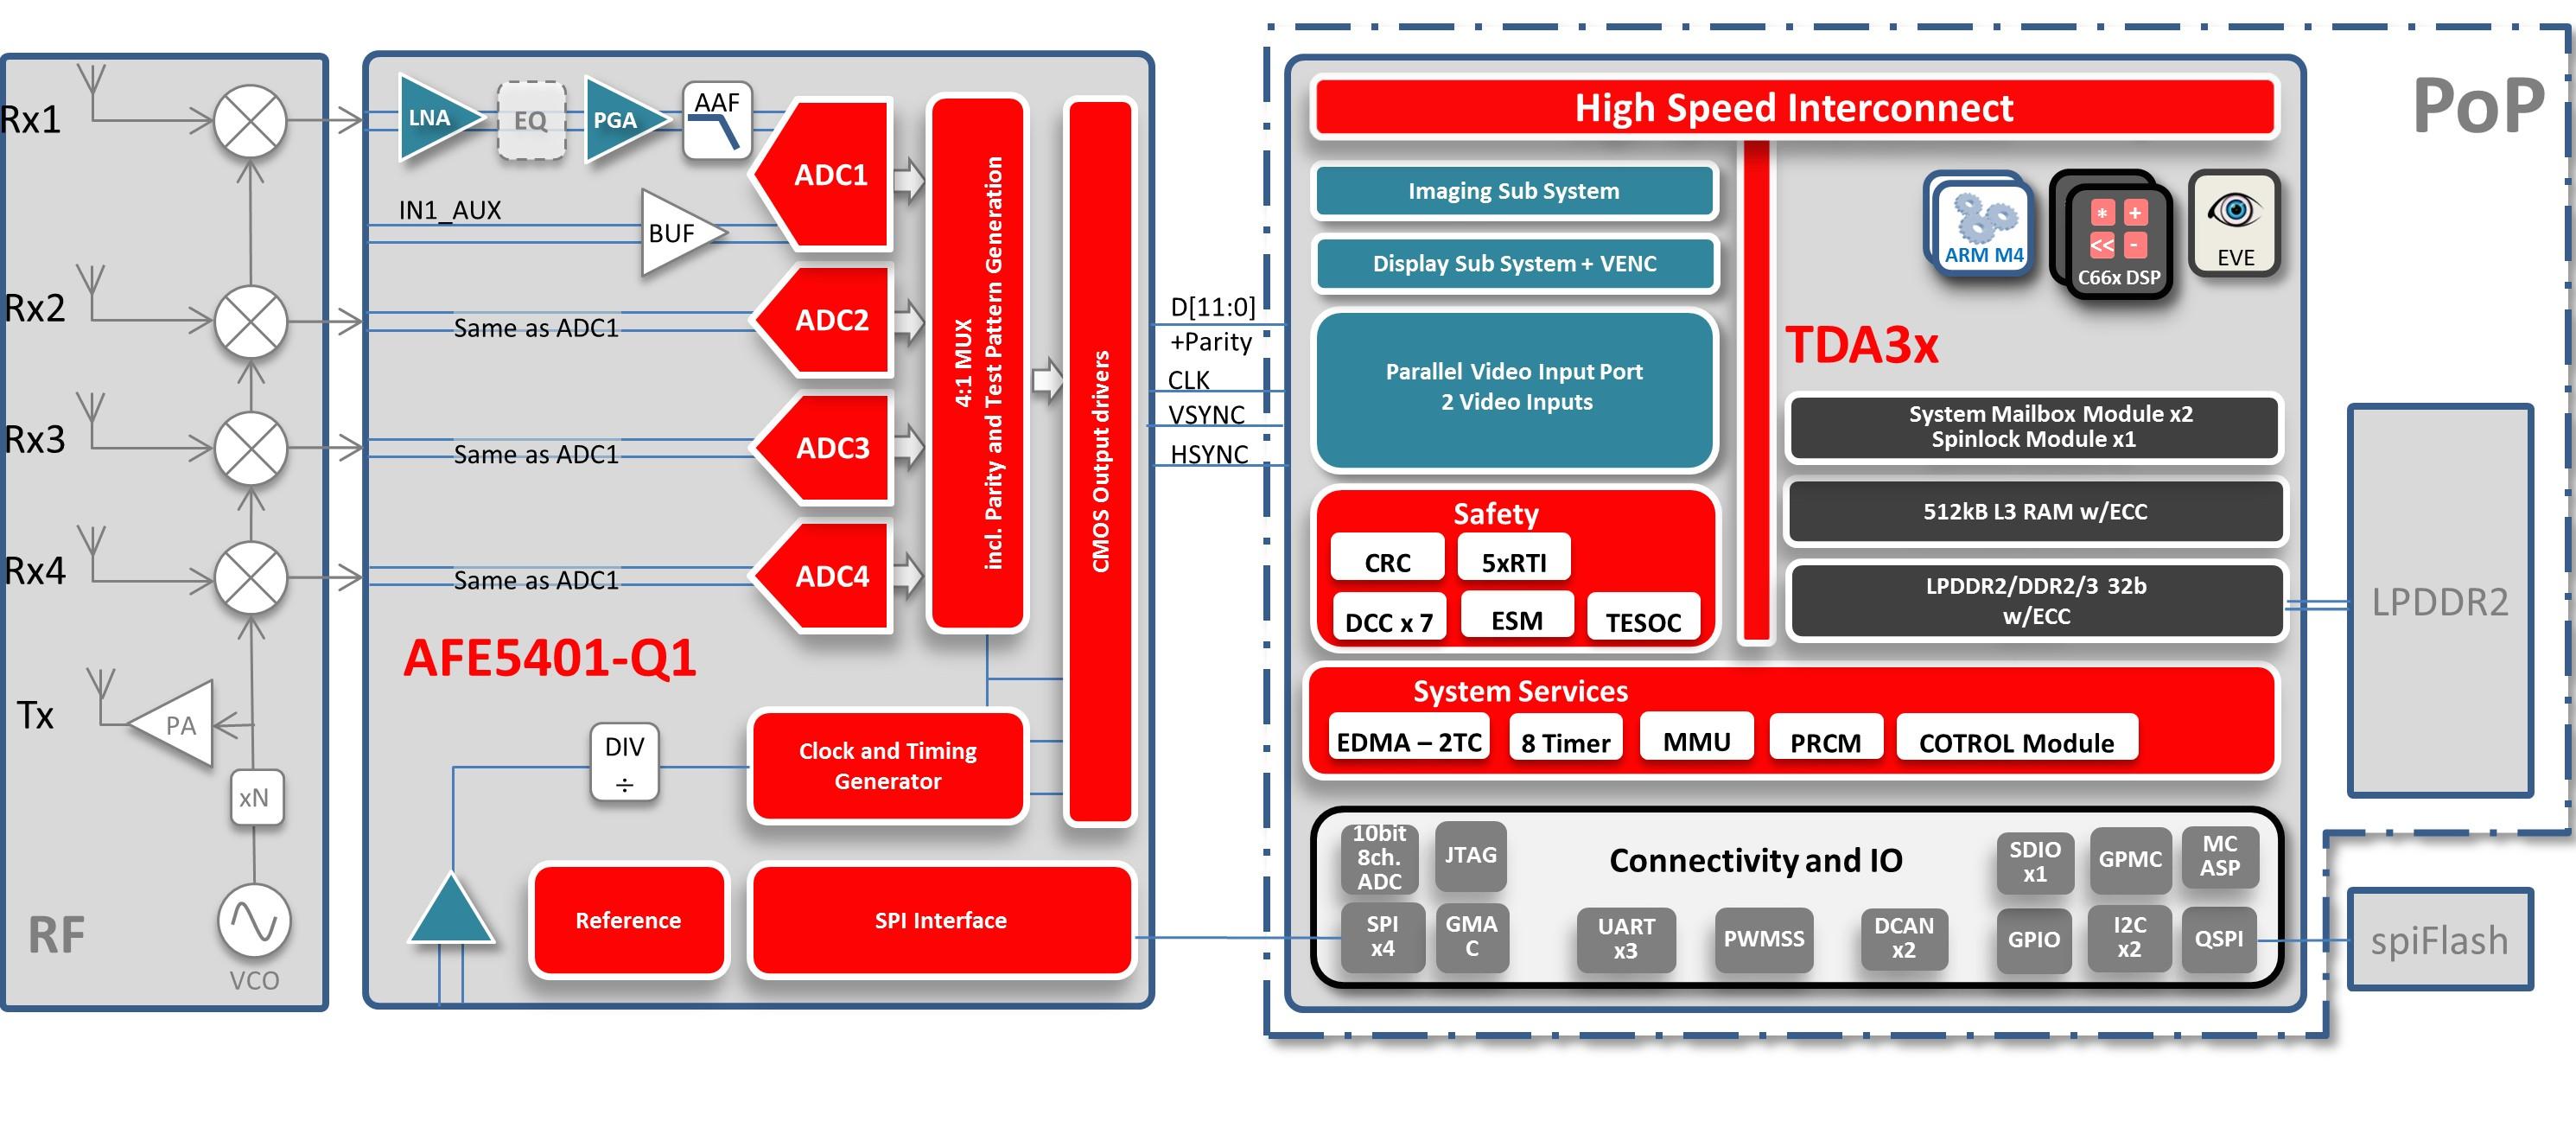 Car Infotainment System Block Diagram An Efficient and Safe Approach ...